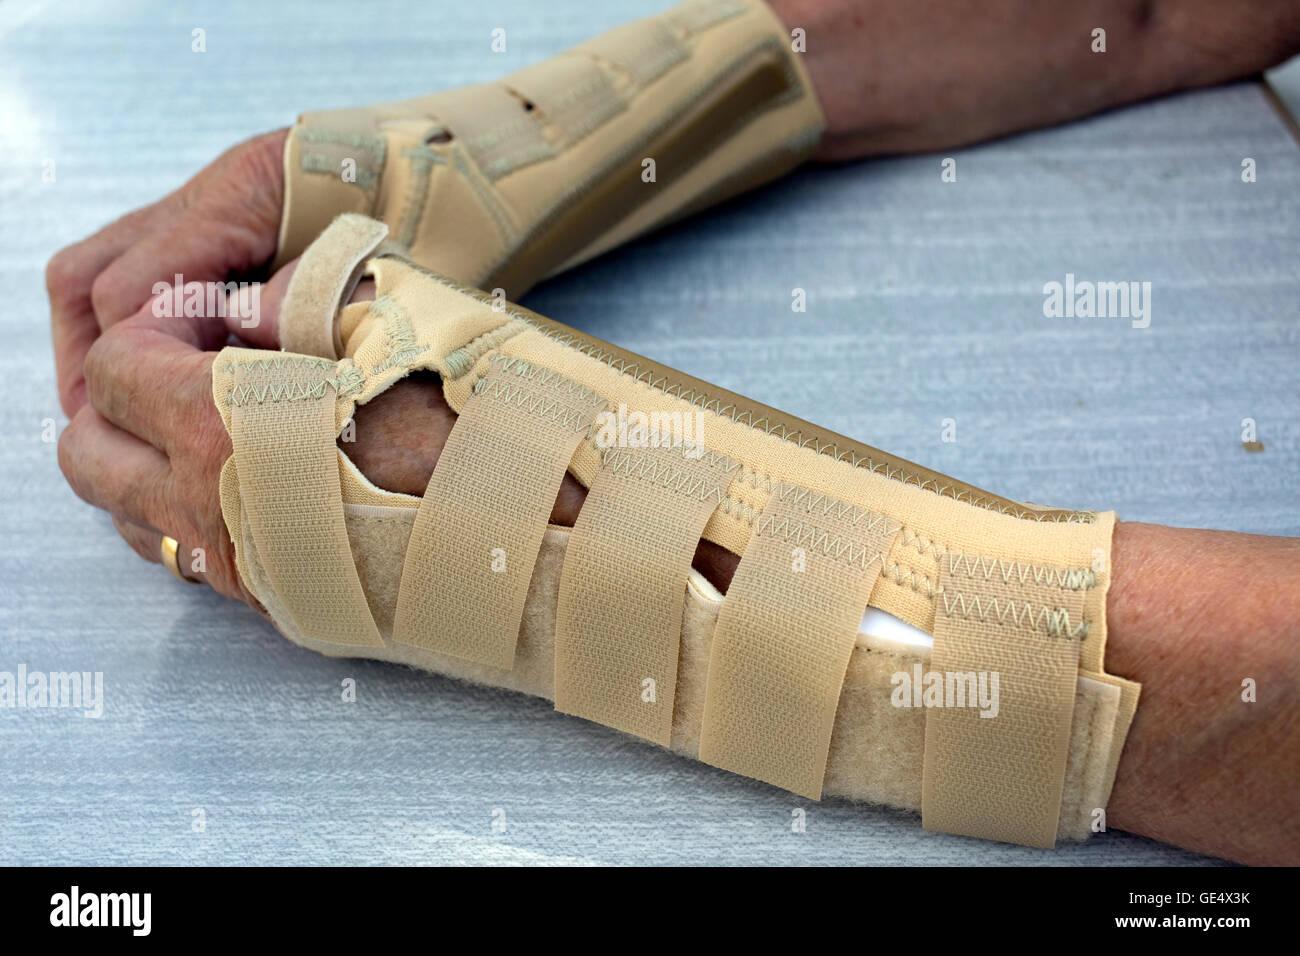 Arthritic hand in Ossur neoprene arthritis wrist brace UK - Stock Image